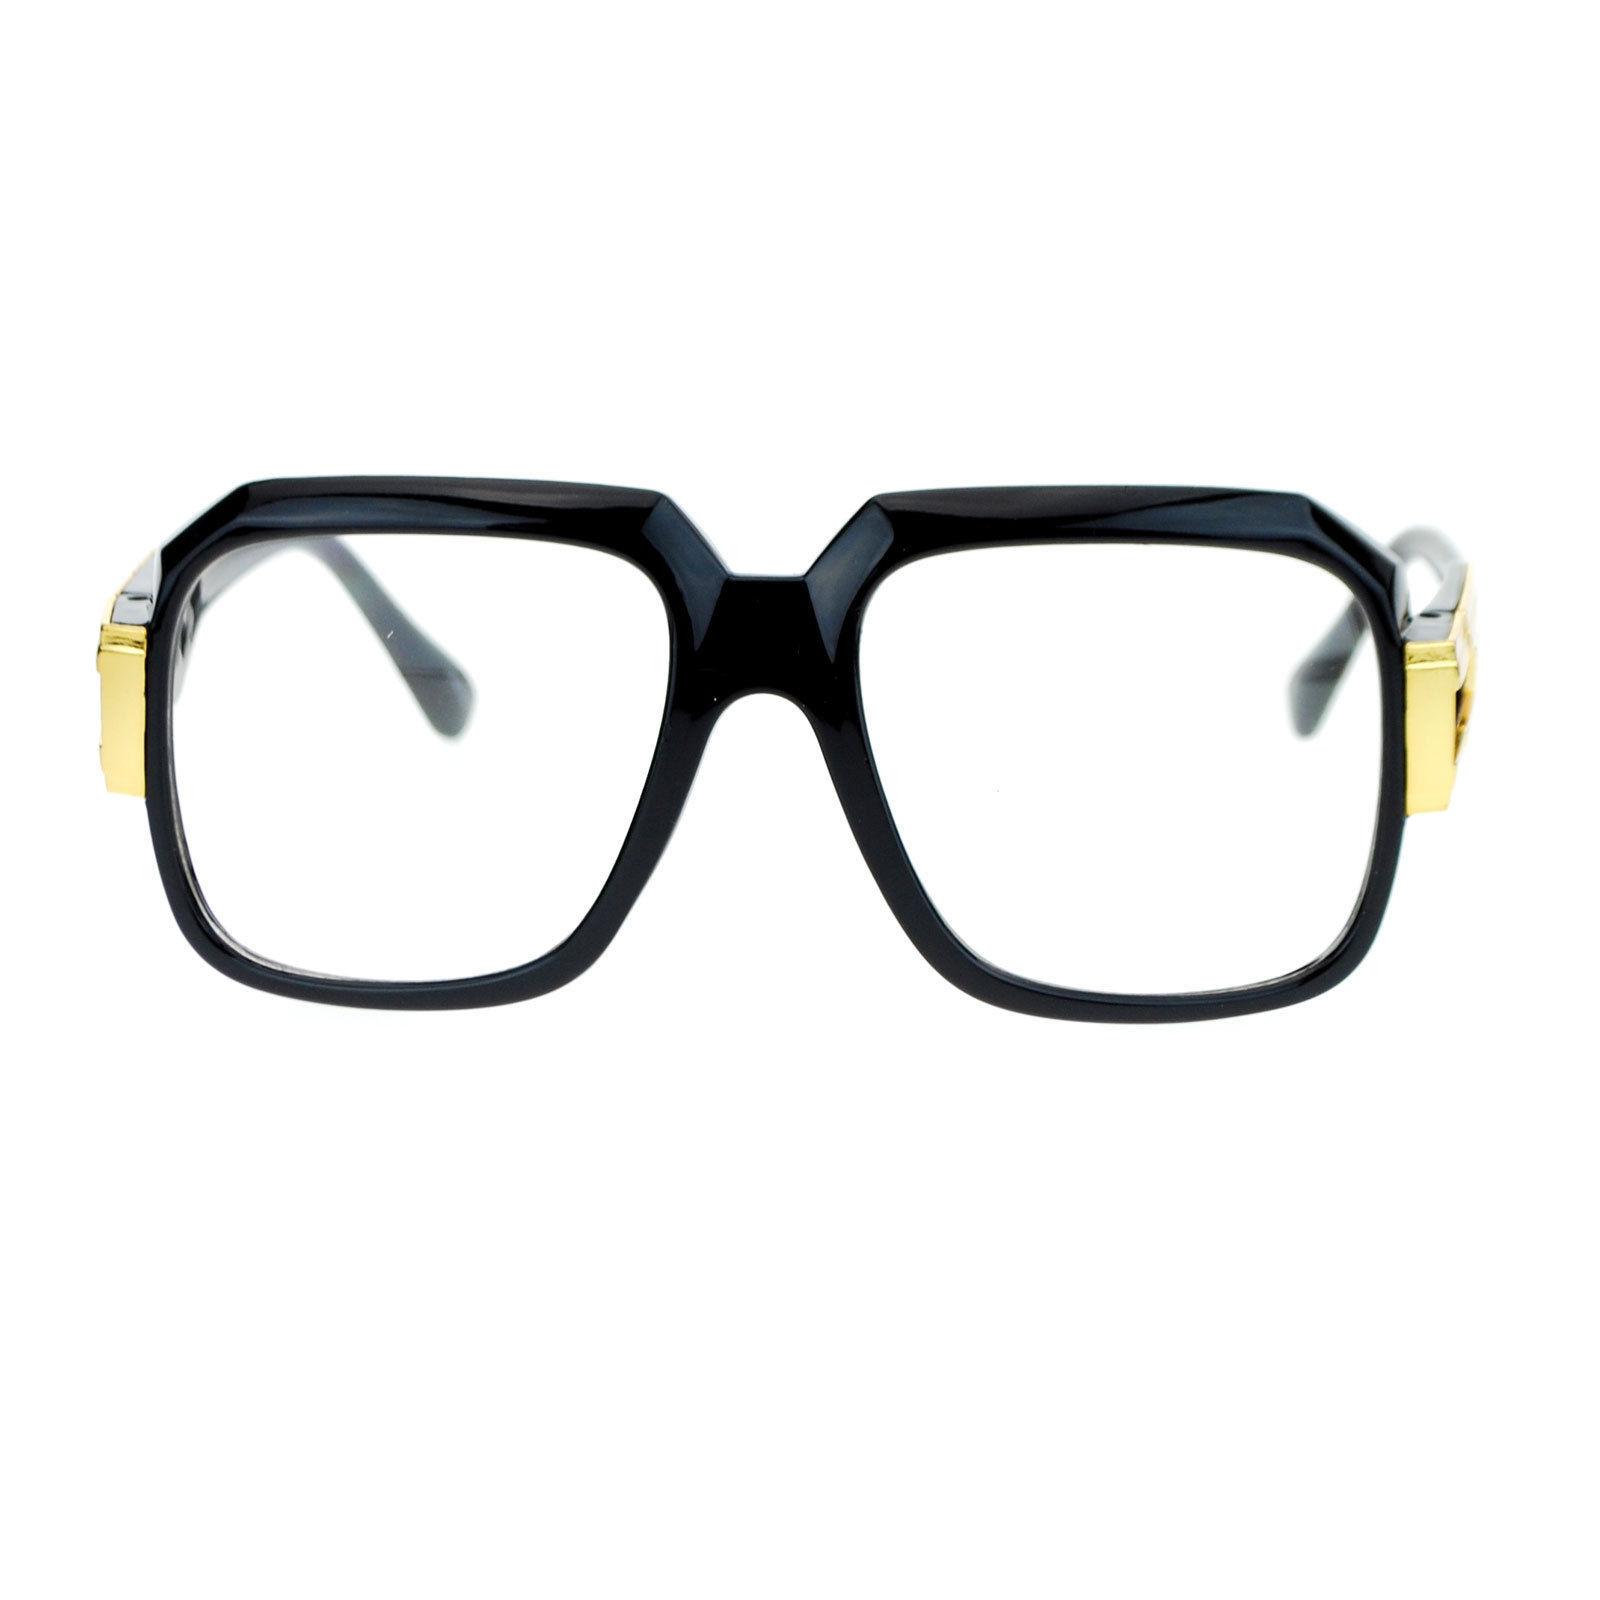 Hip Retro Clear Lens Glasses Oversized Square Fashion Eyeglasses